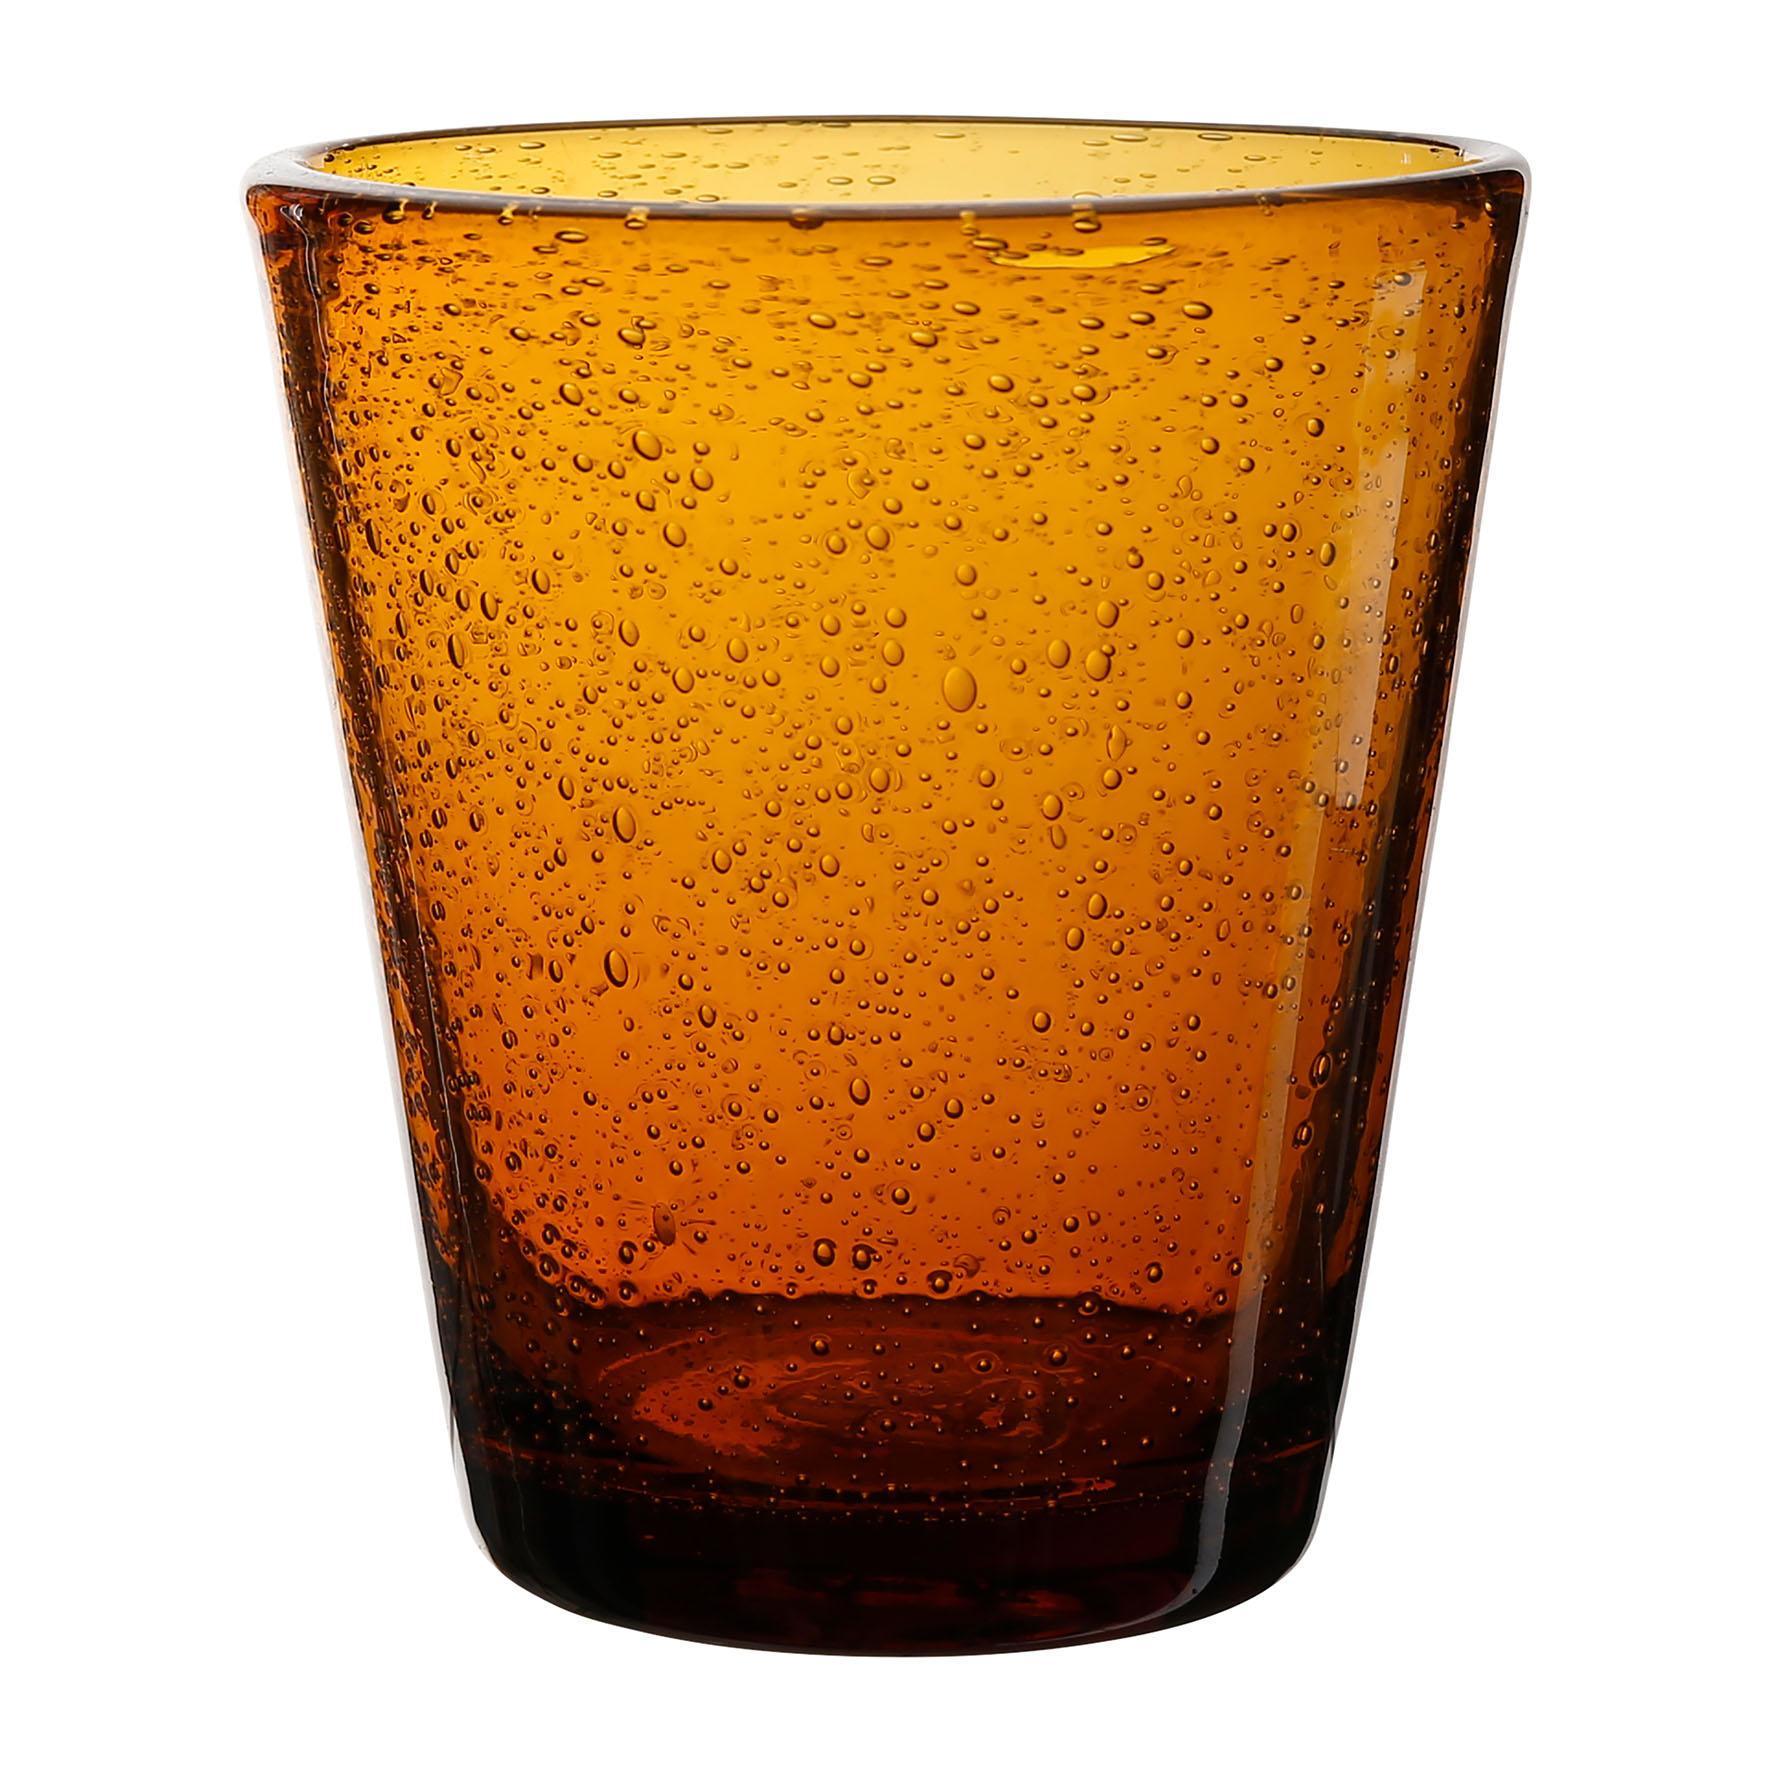 CÔTÉ TABLE Sklenice - Pernille Ambre, oranžová barva, hnědá barva, čirá barva, sklo